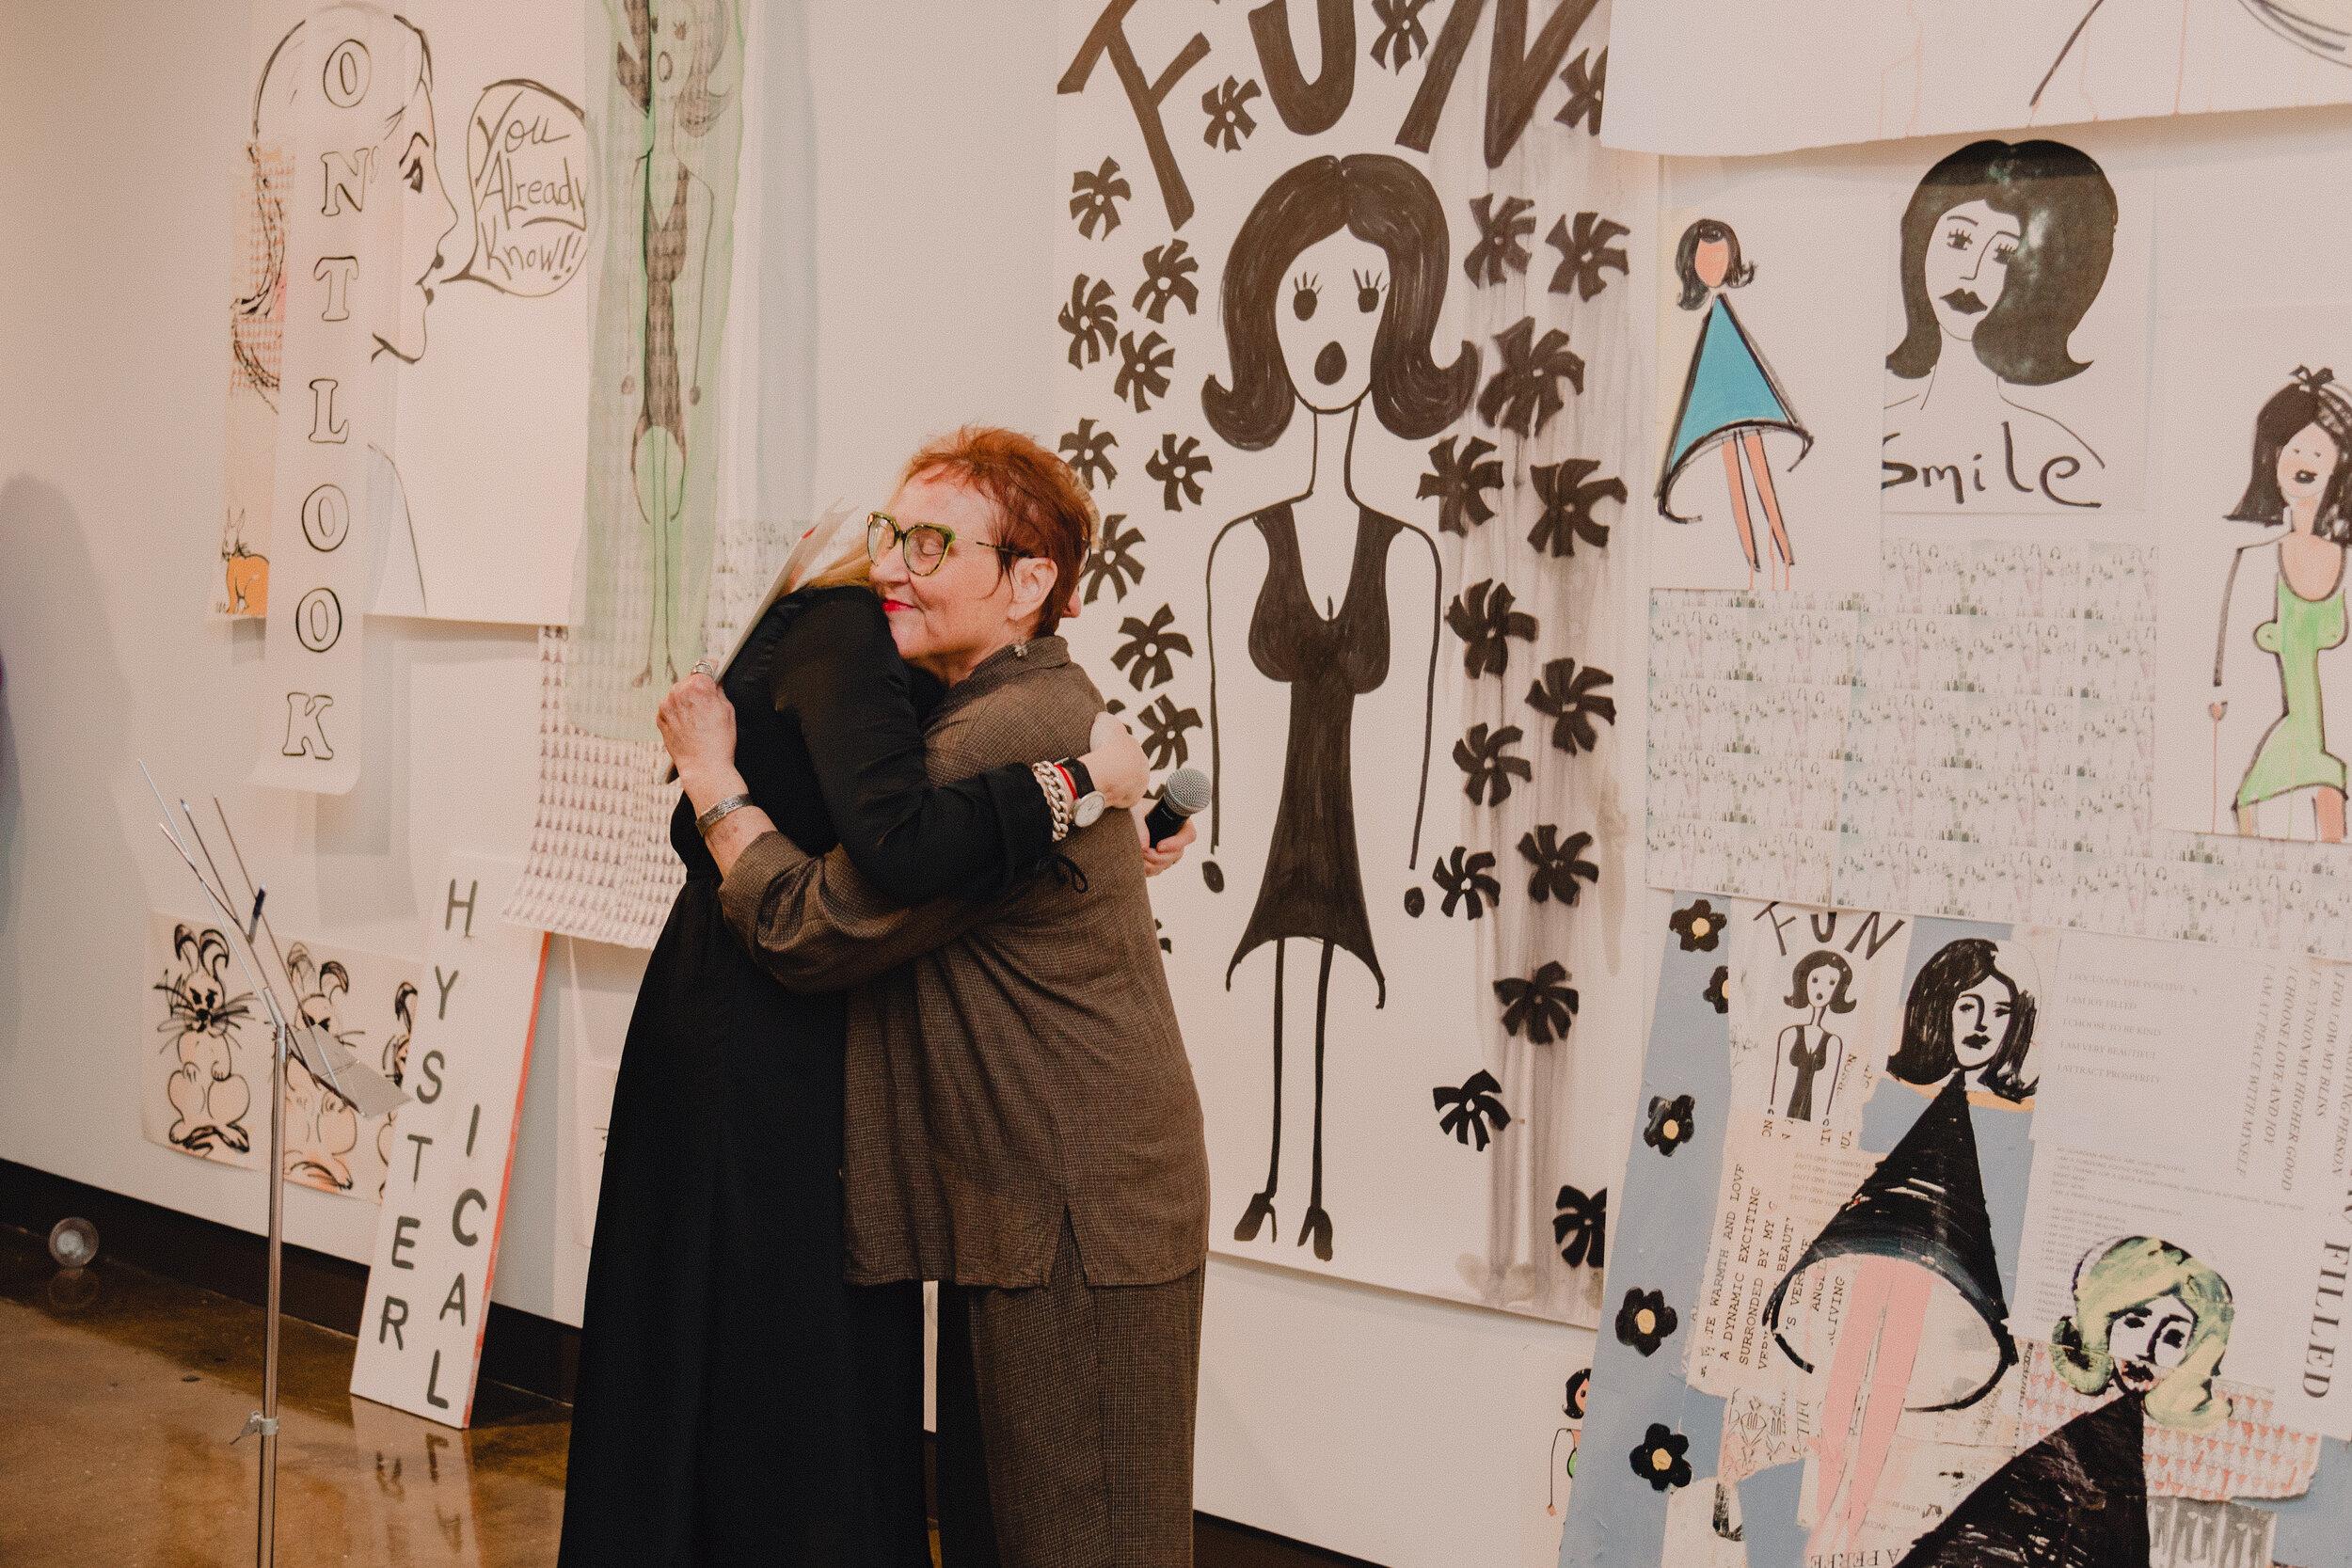 Debbie Millman hugs Pam Butler